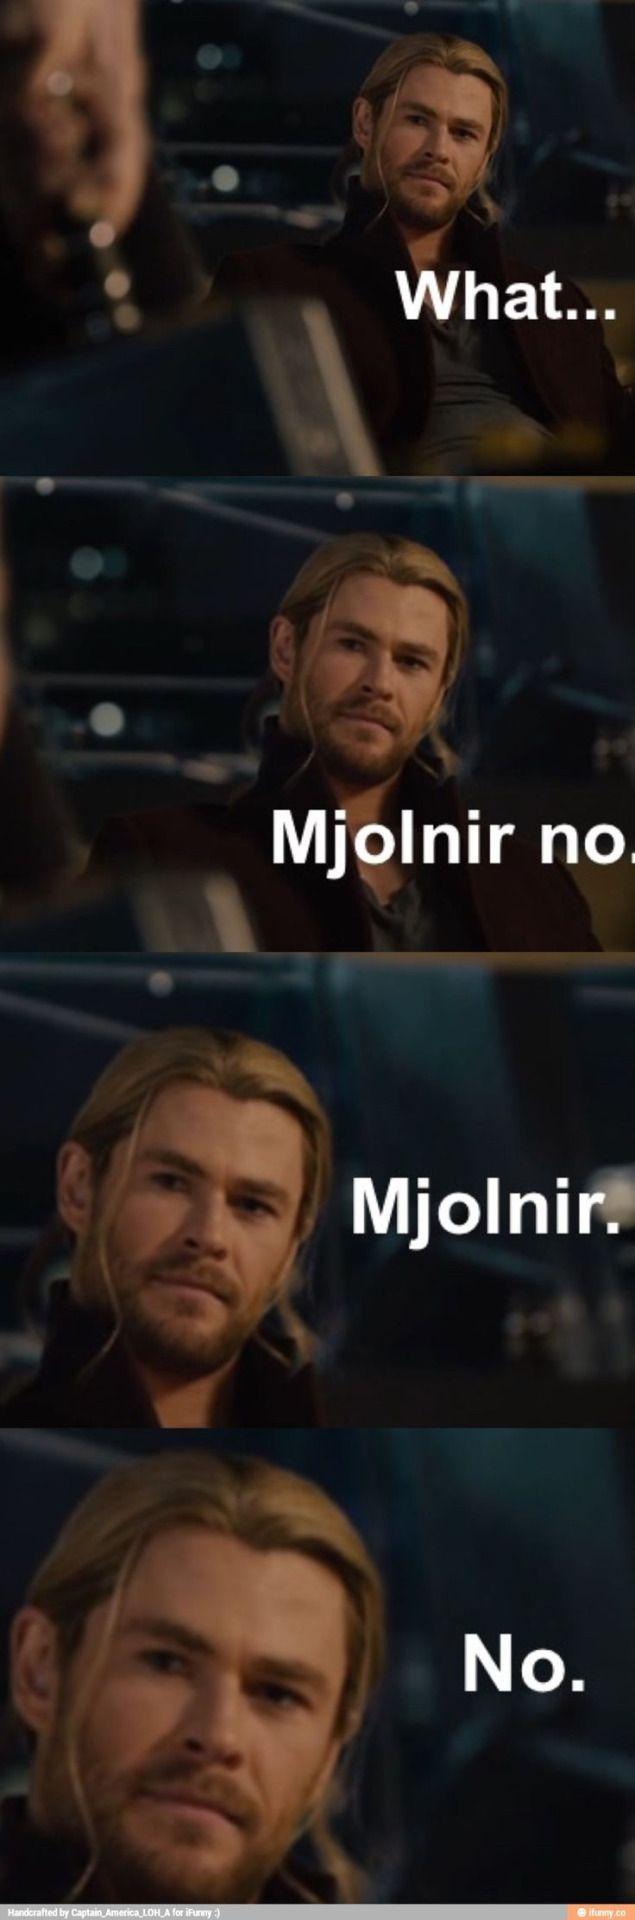 For more such funny Superhero meme follow us and also visit our website: www.nerdysaint.com (Favorite Meme Captain America)